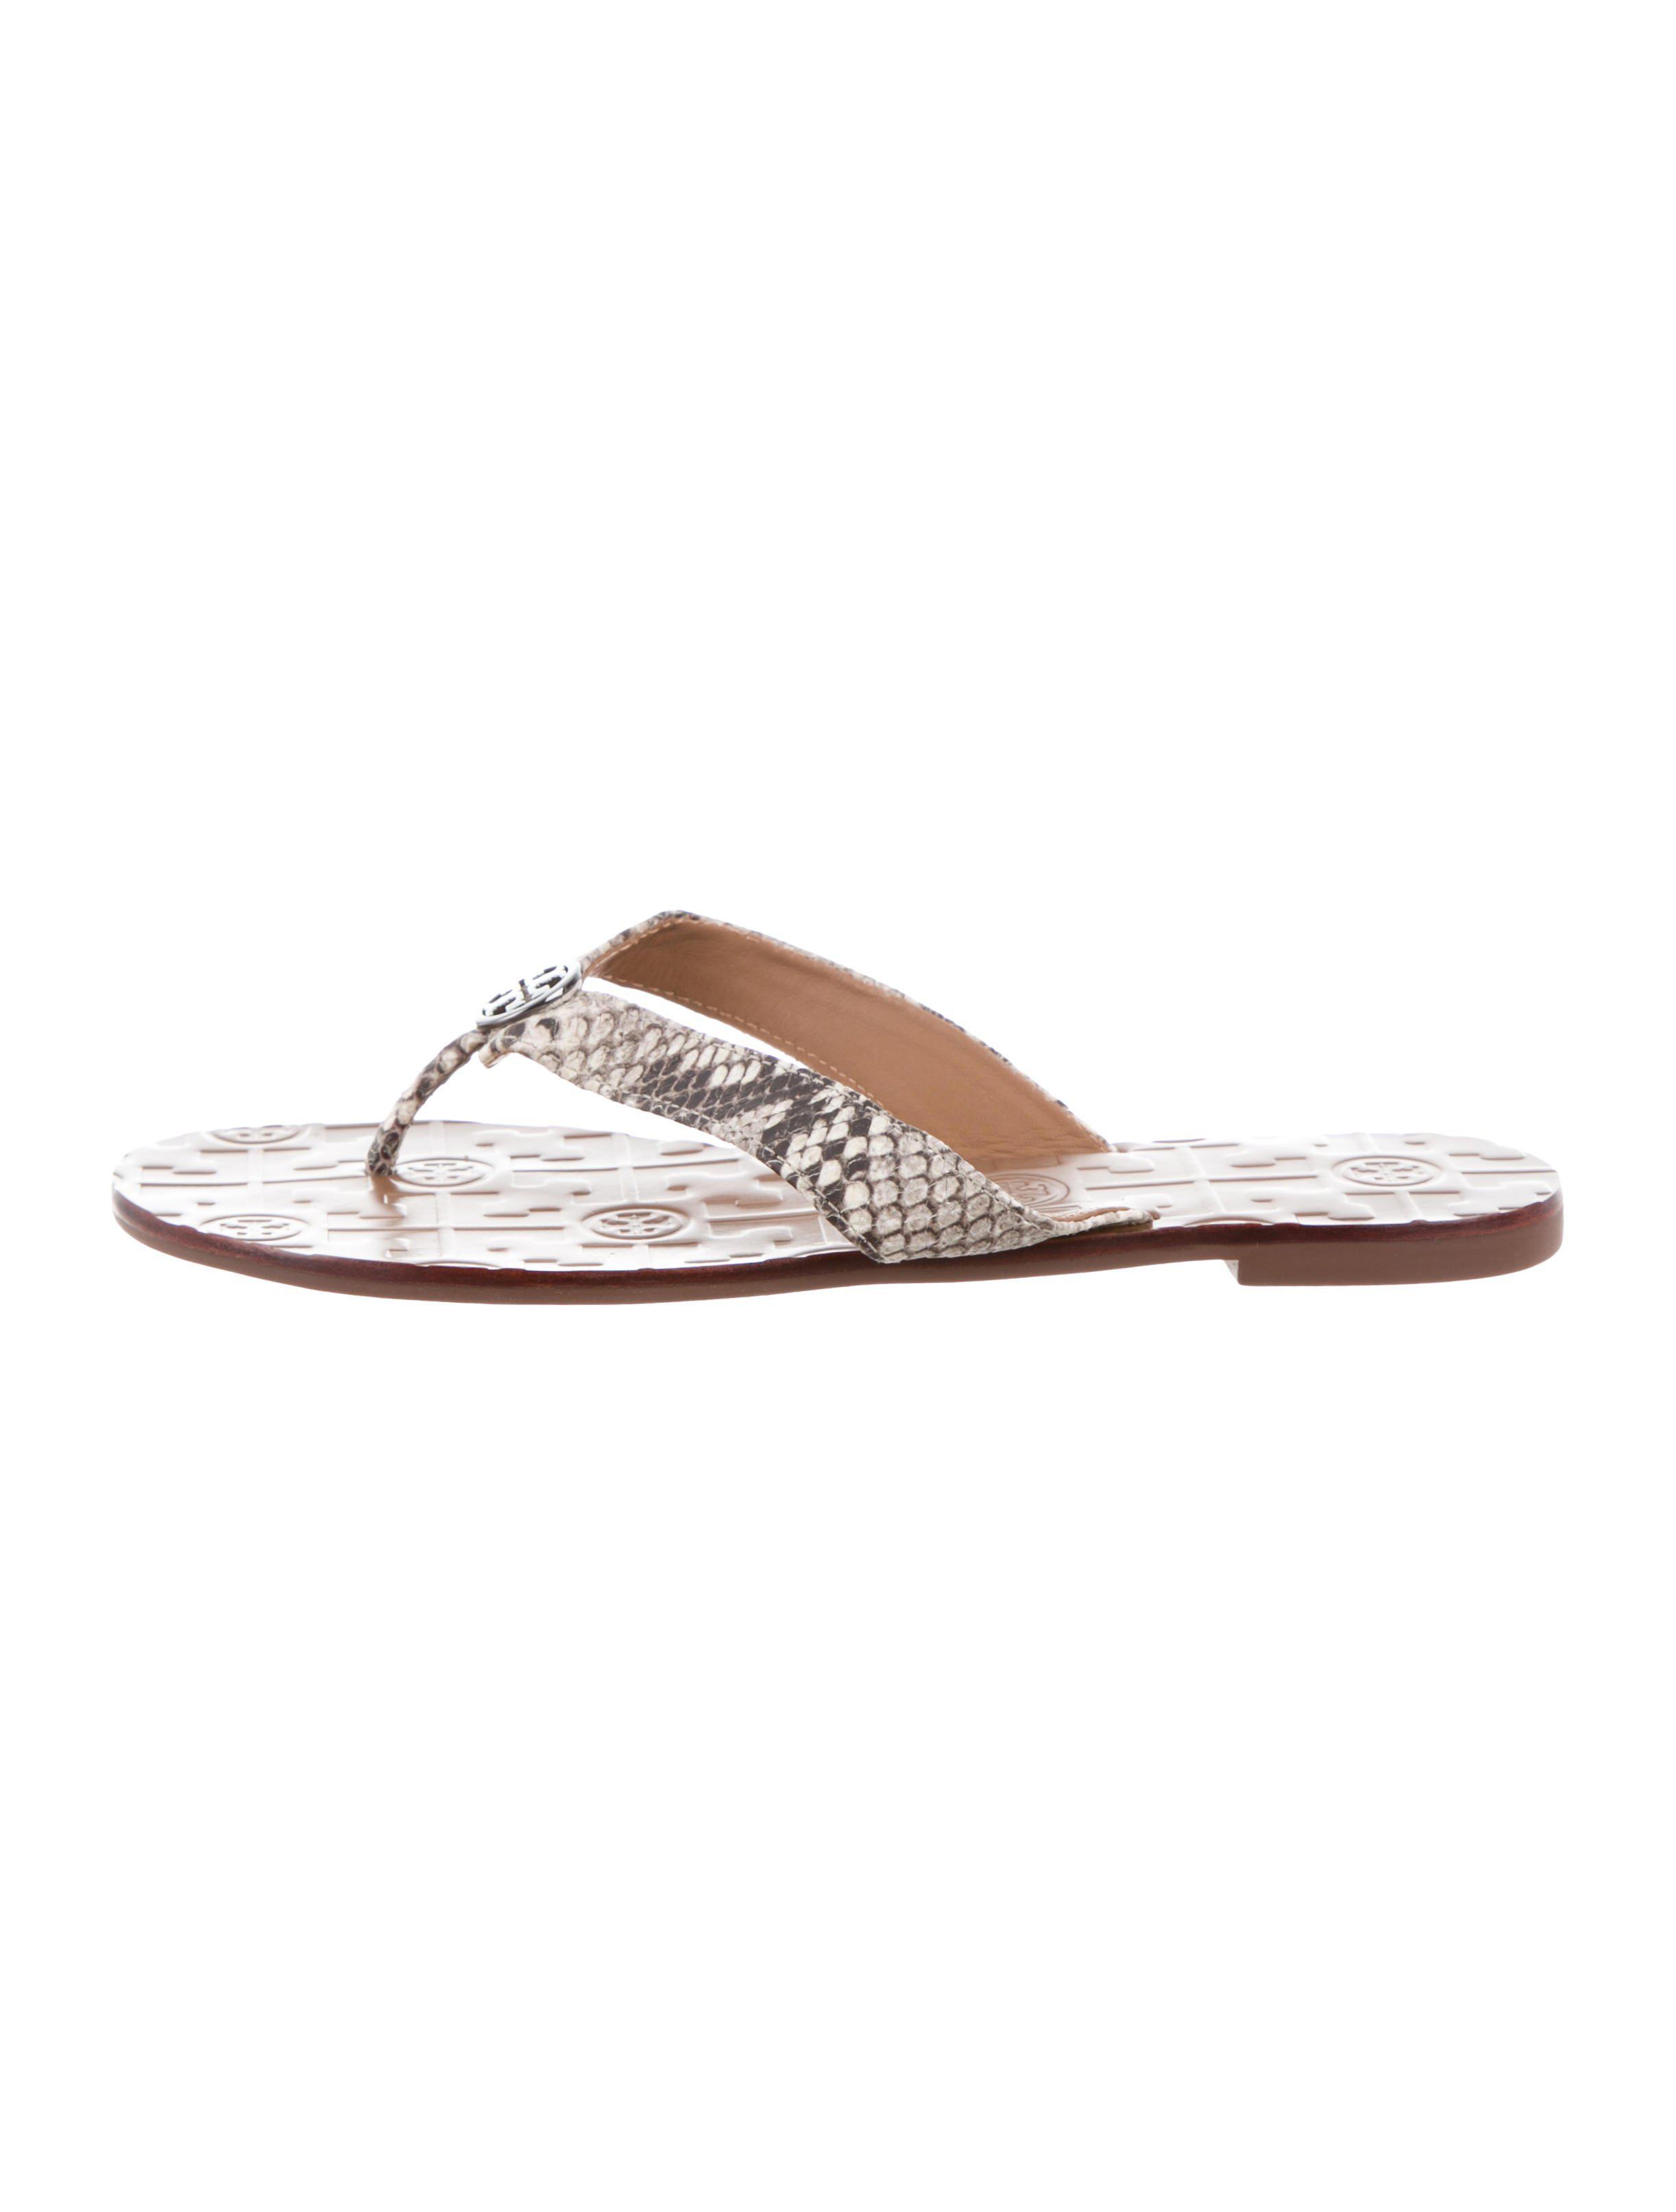 f197136468ef Lyst - Tory Burch Embossed Slide Sandals Beige in Natural